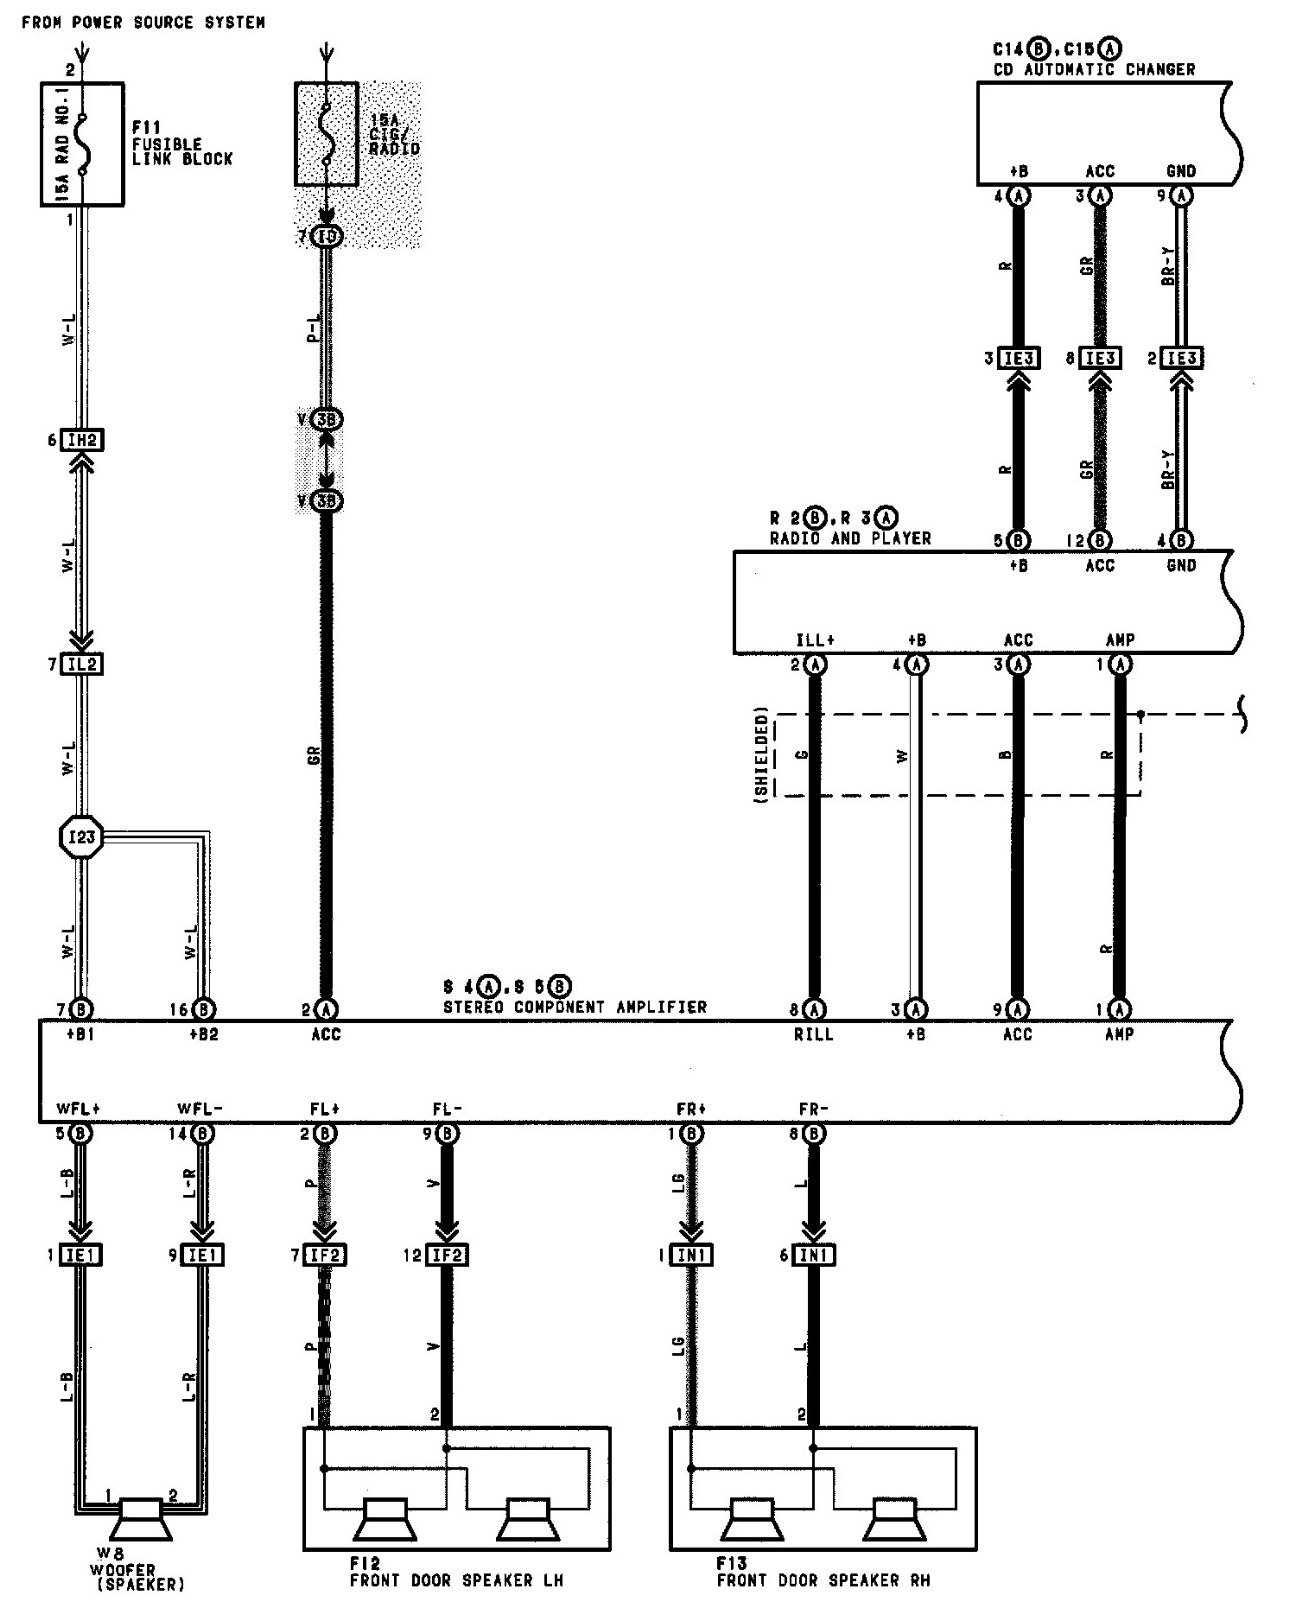 2003 toyota avalon stereo wiring diagram Download-2003 toyota Avalon Stereo Wiring Diagram toyota Prius Wiring Diagram Pdf Lovely Fantastic Viper 3105v 15-i